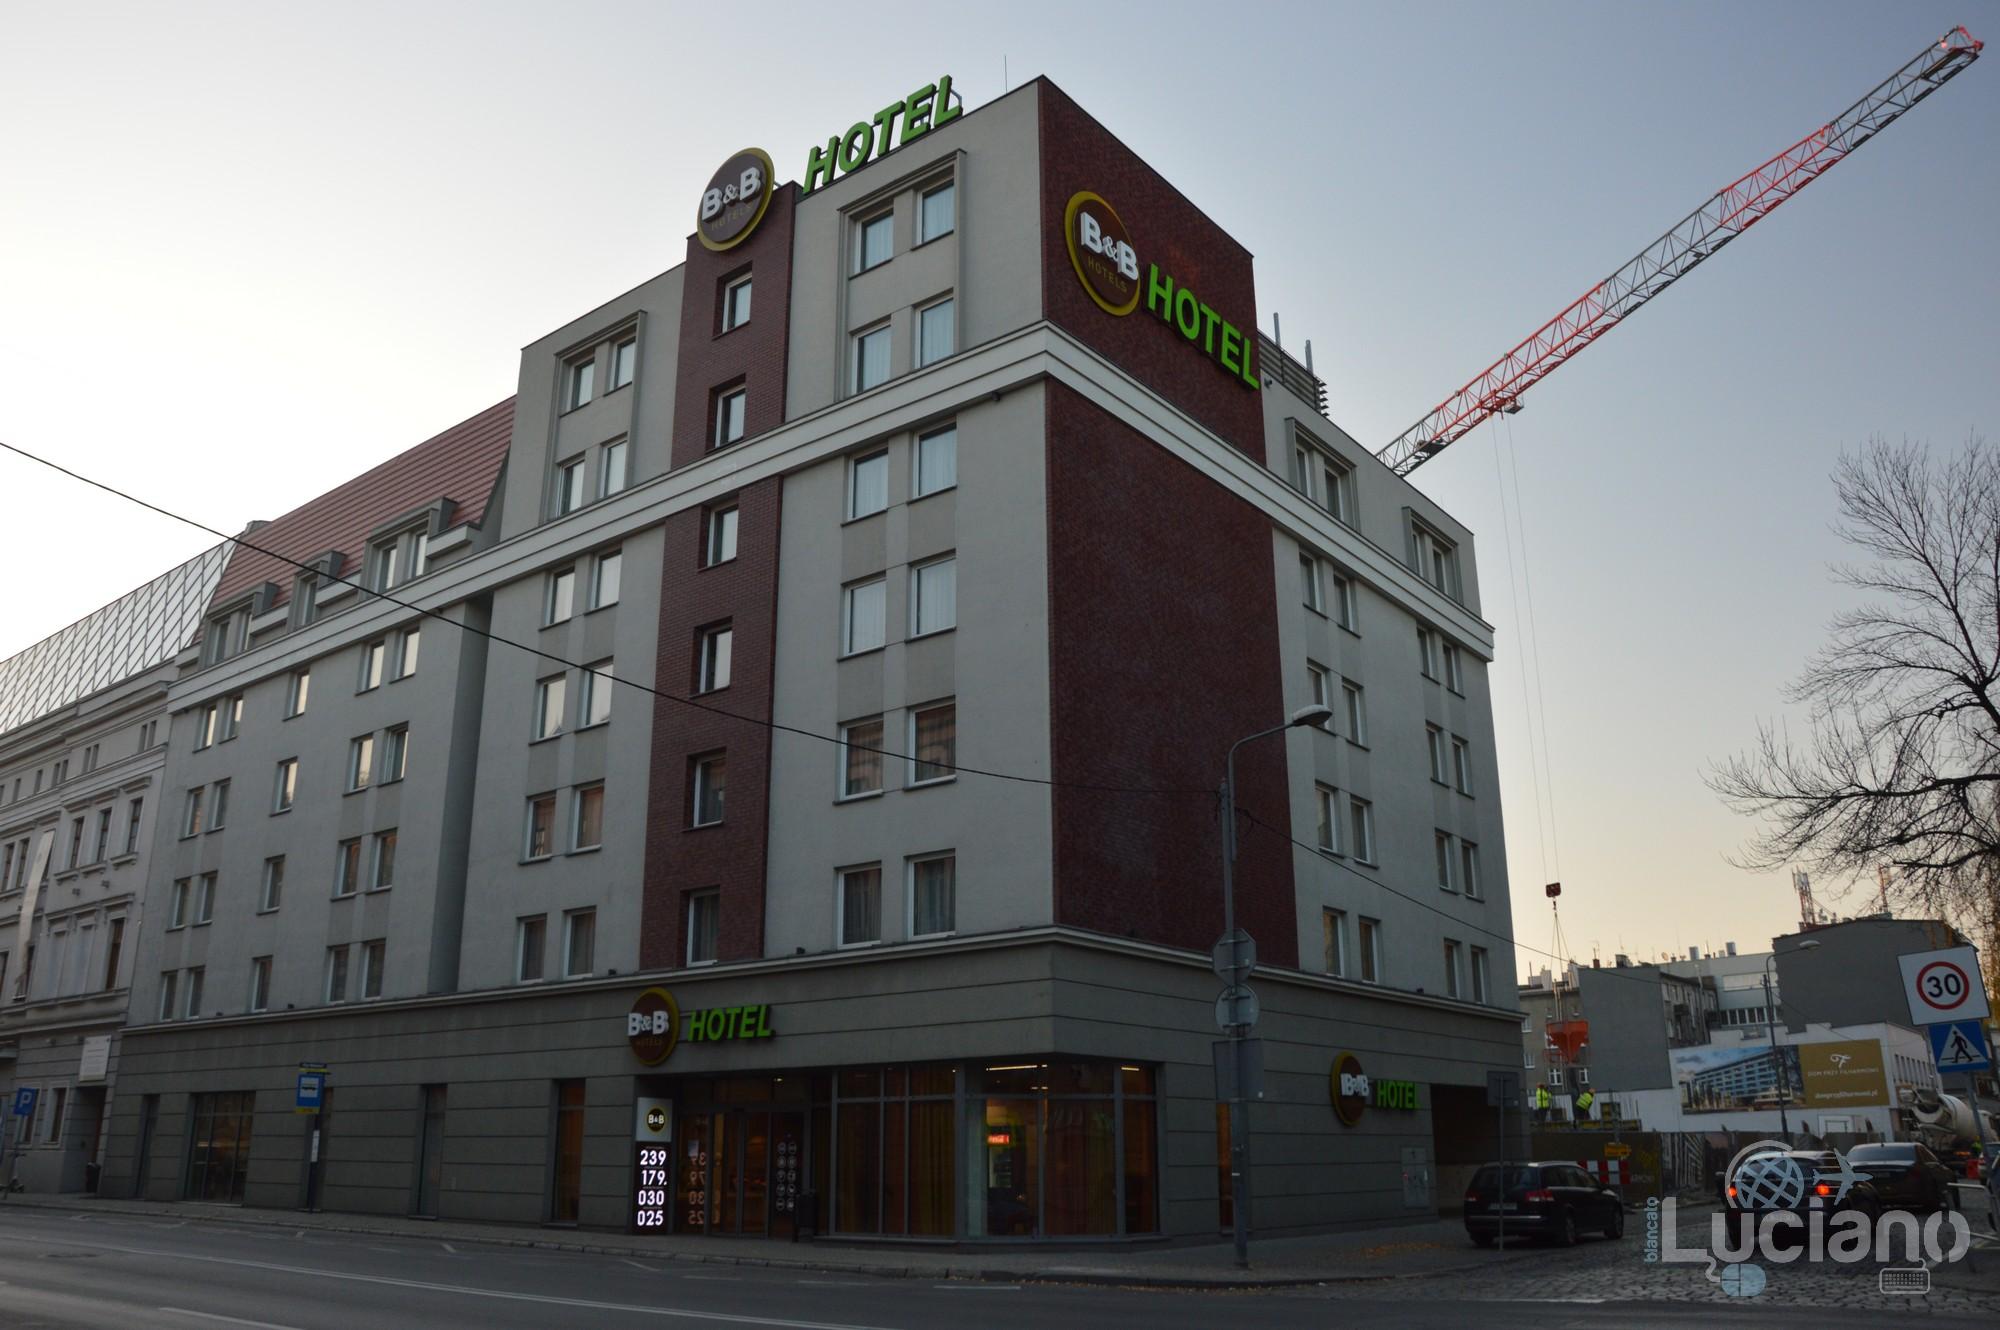 b&b katowice centrum - Poland